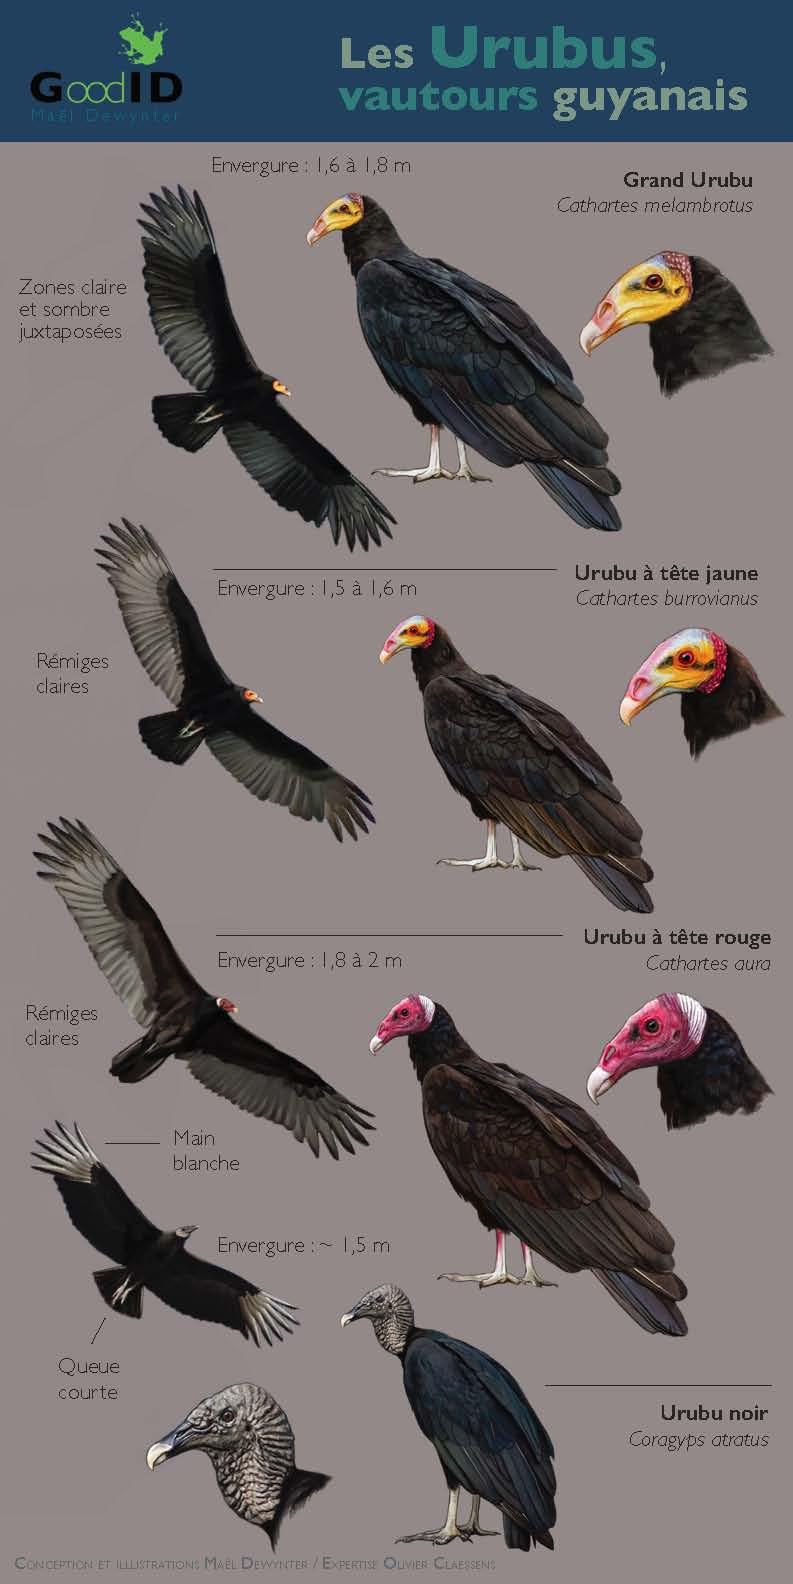 https://cdnfiles1.biolovision.net/www.faune-guyane.fr/userfiles/Documentsdivers/Oiseaux/MemoUrubusM.Dewynter110520.jpg